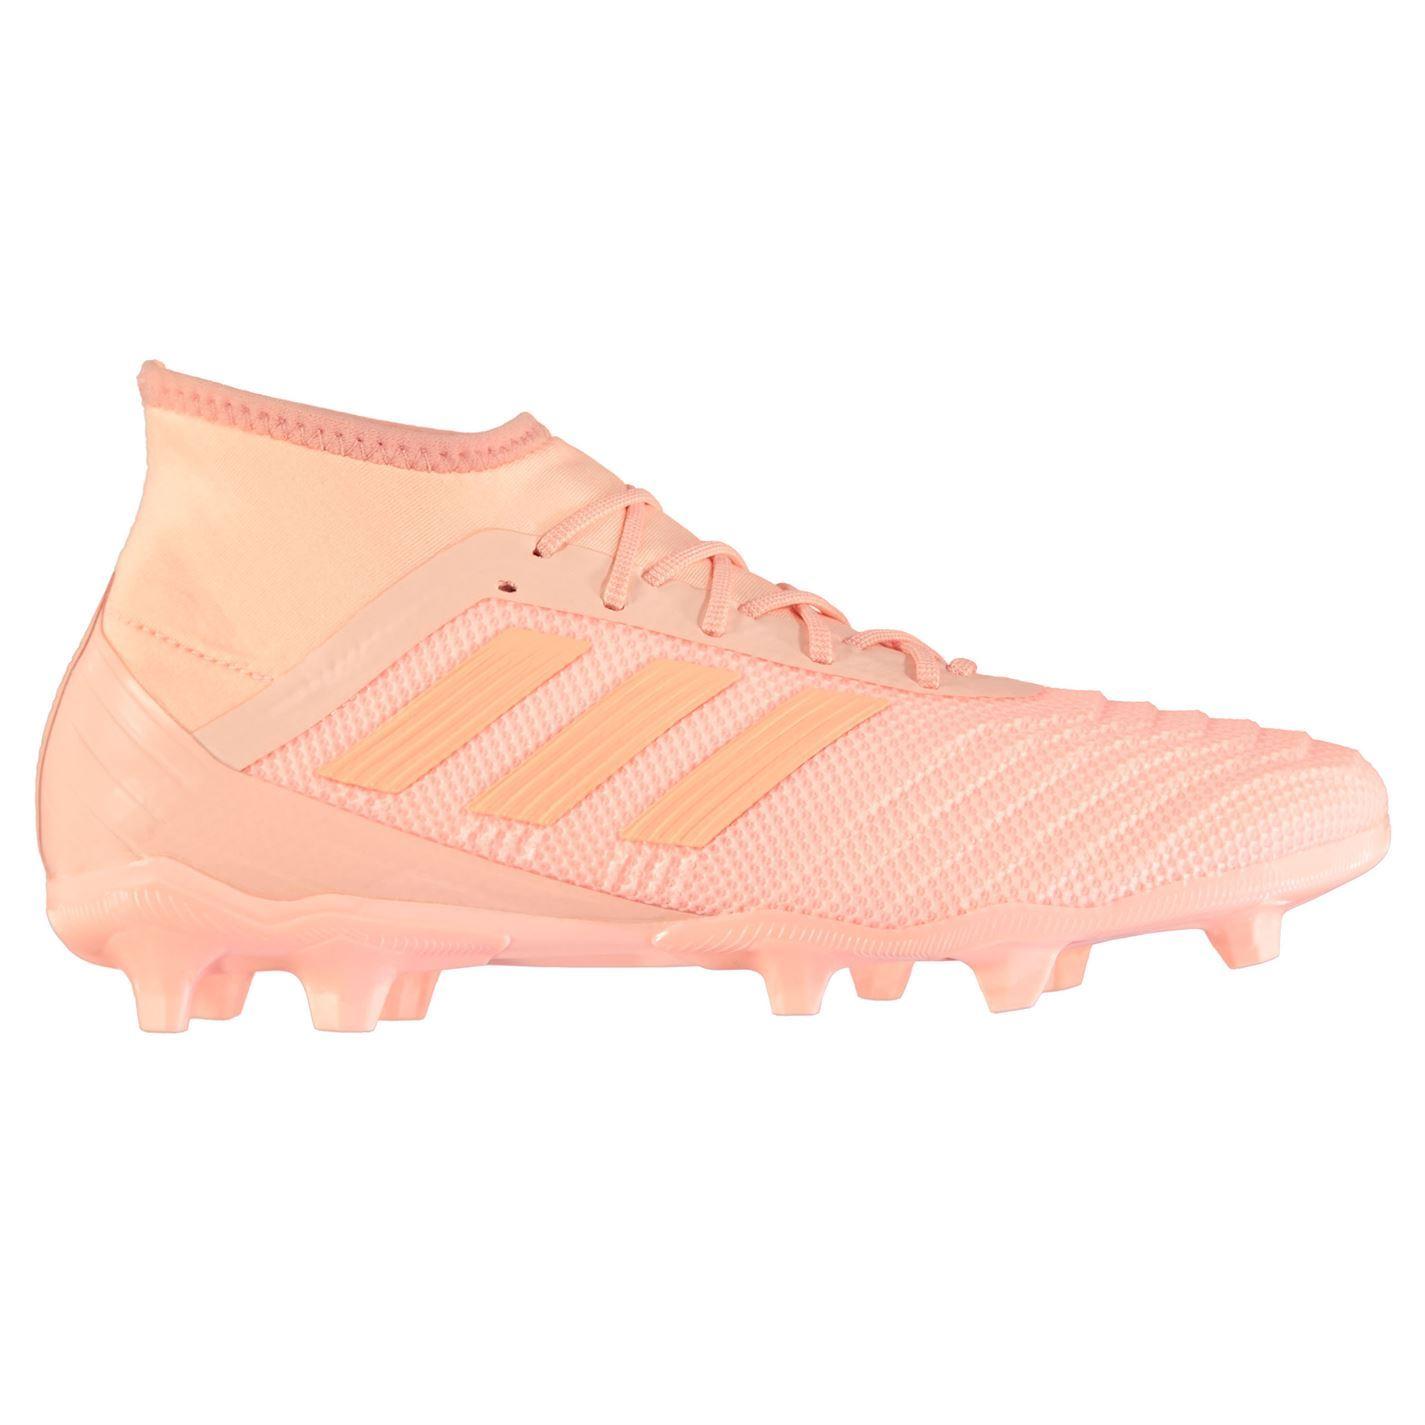 Adidas-Predator-18-2-FG-Firm-Ground-Chaussures-De-Football-Homme-Football-Chaussures-Crampons miniature 9